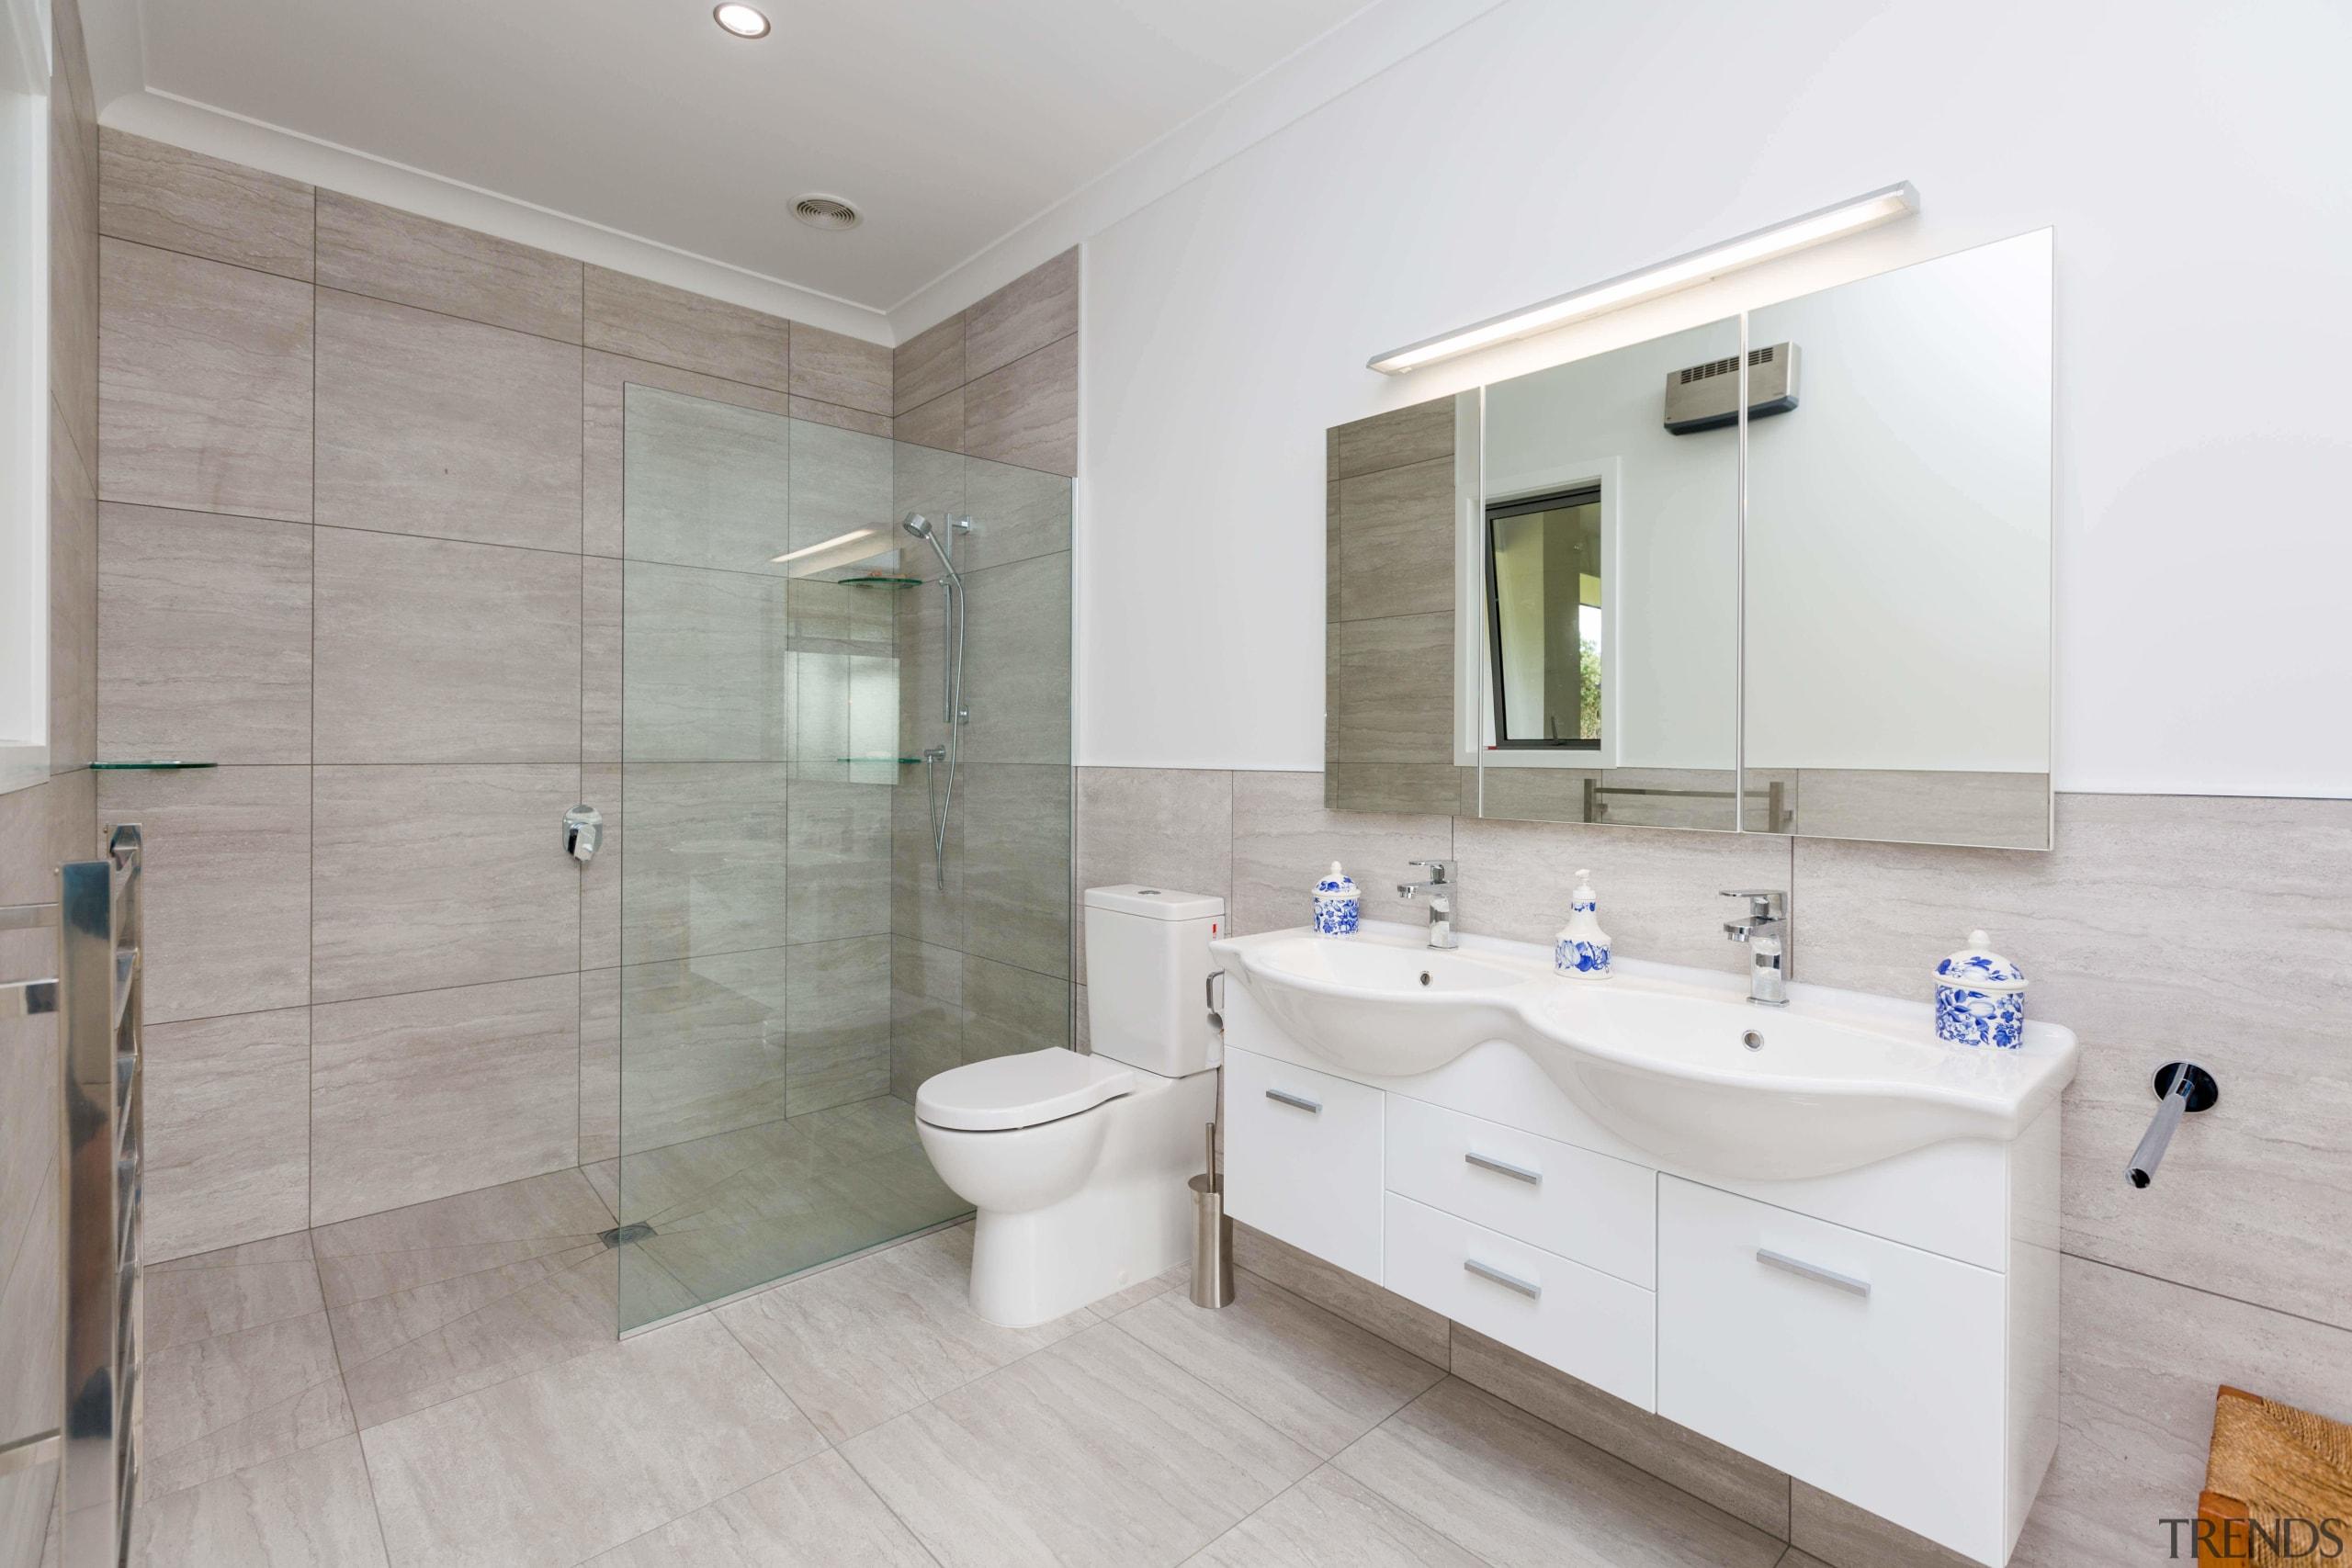 This master suite features has a Michel Caesar bathroom, estate, floor, home, interior design, property, real estate, room, sink, tile, gray